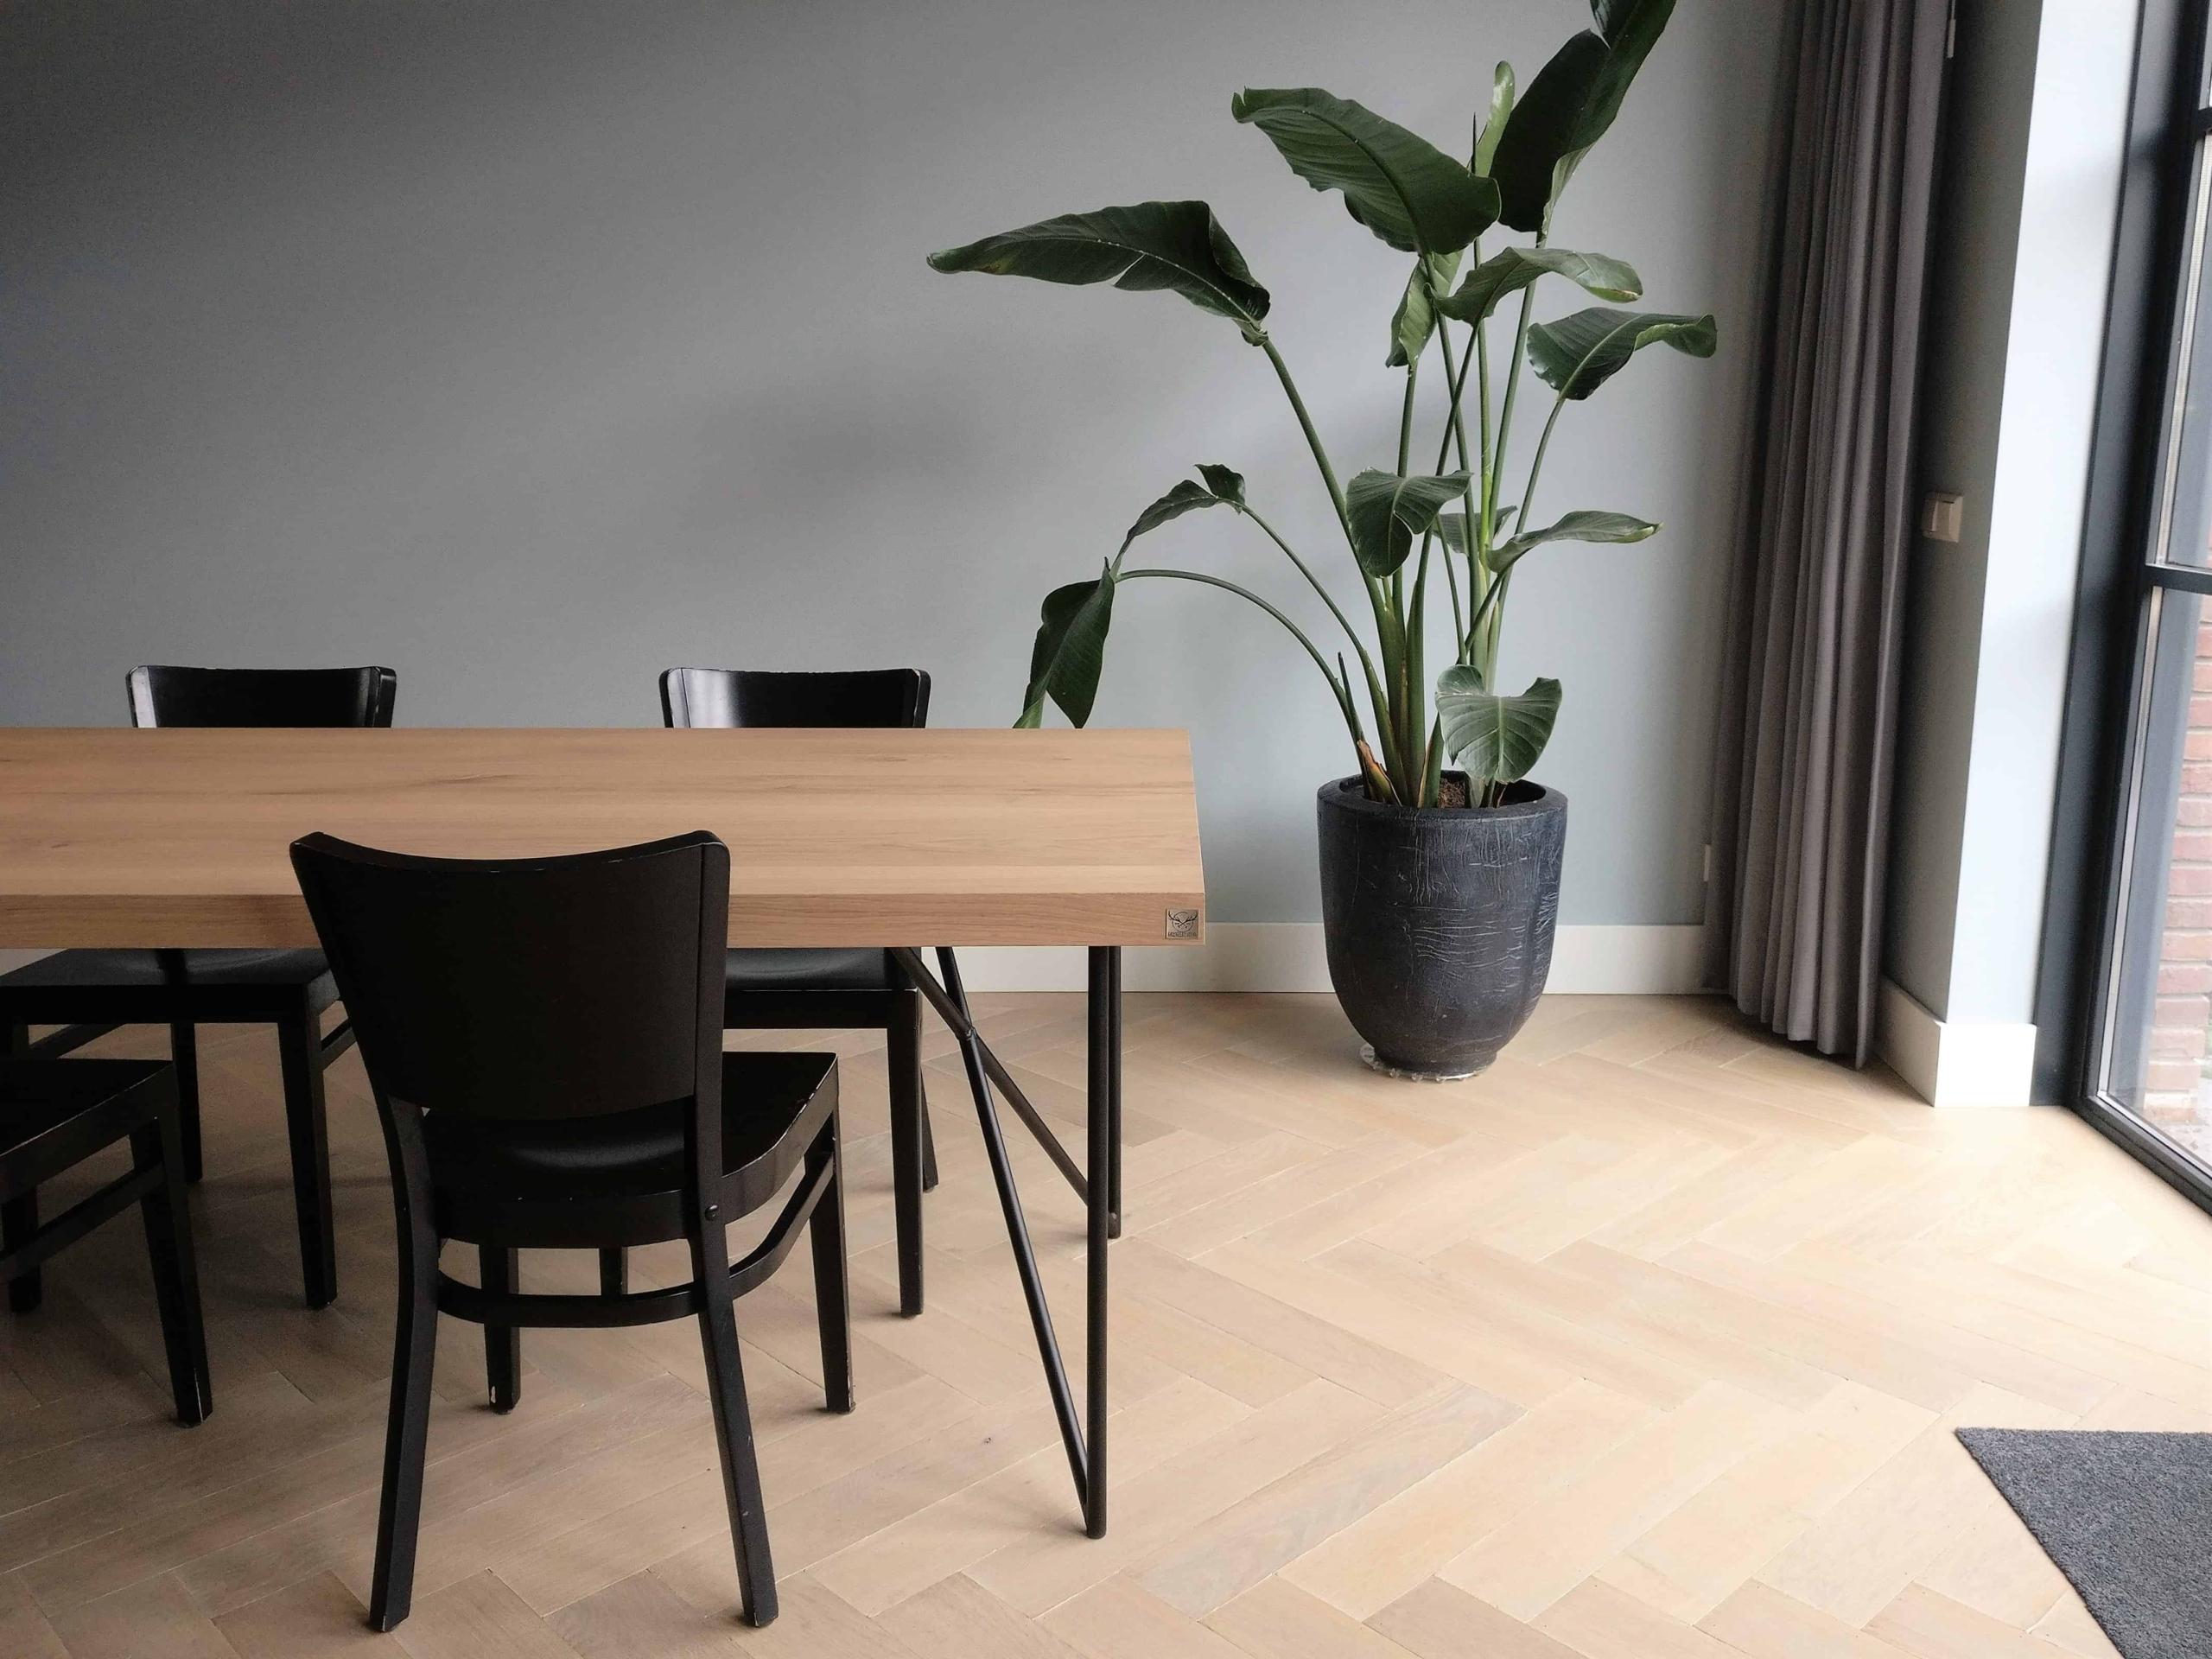 Interieur inspiratie eiken tafel